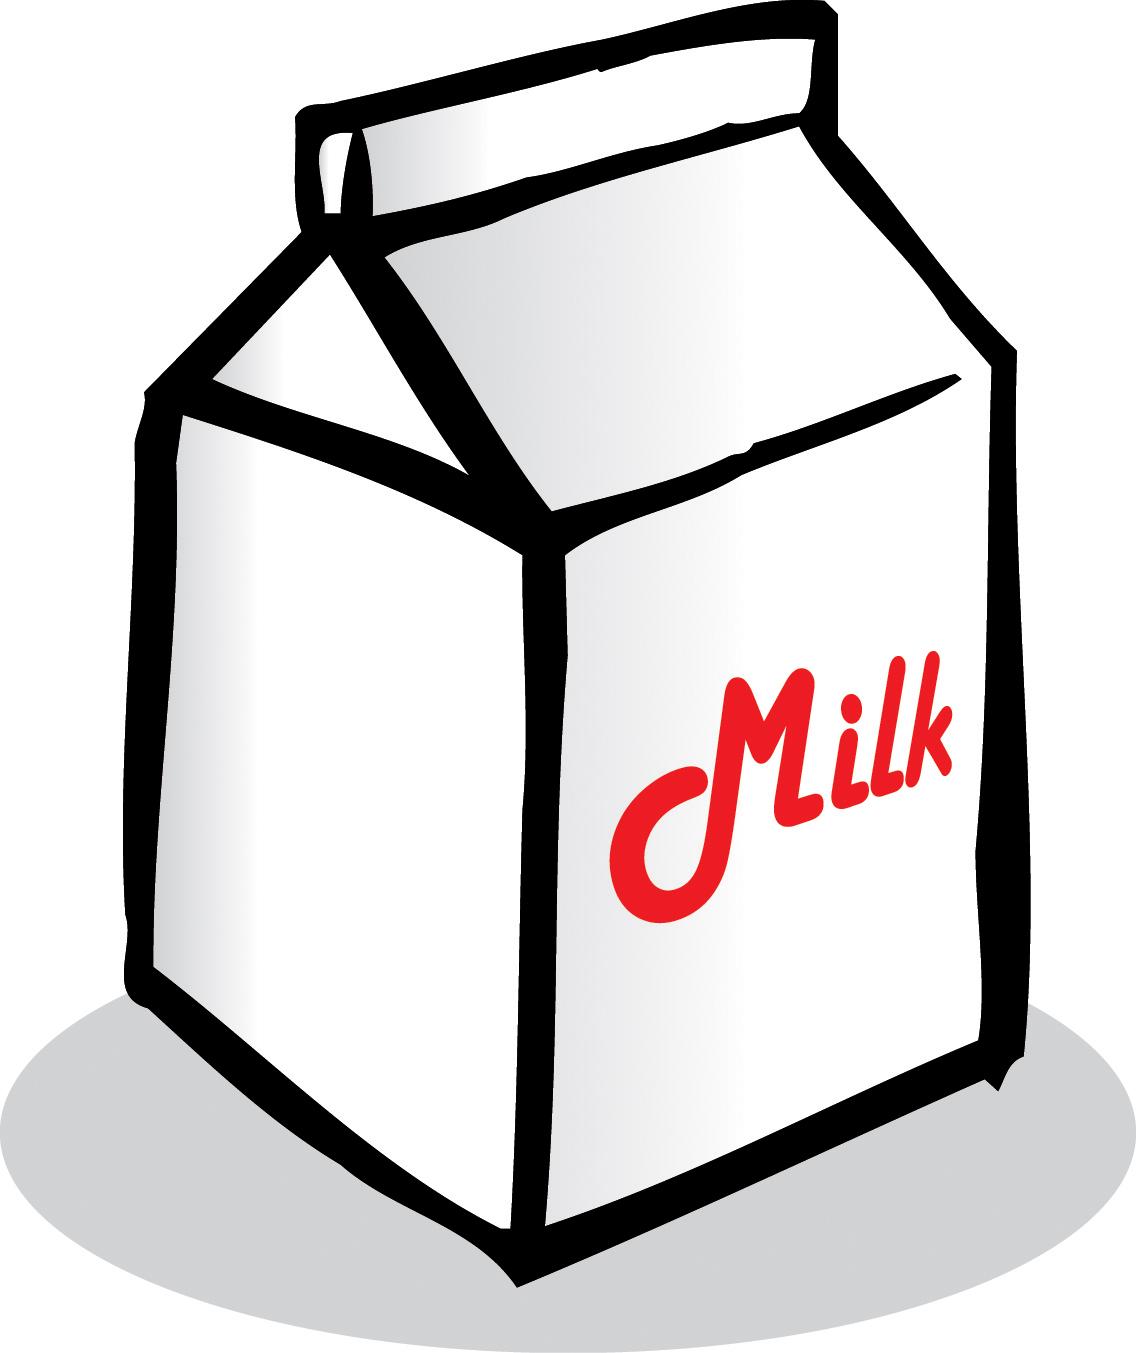 Milk Carton clipart Carton And Milk Clipart Free